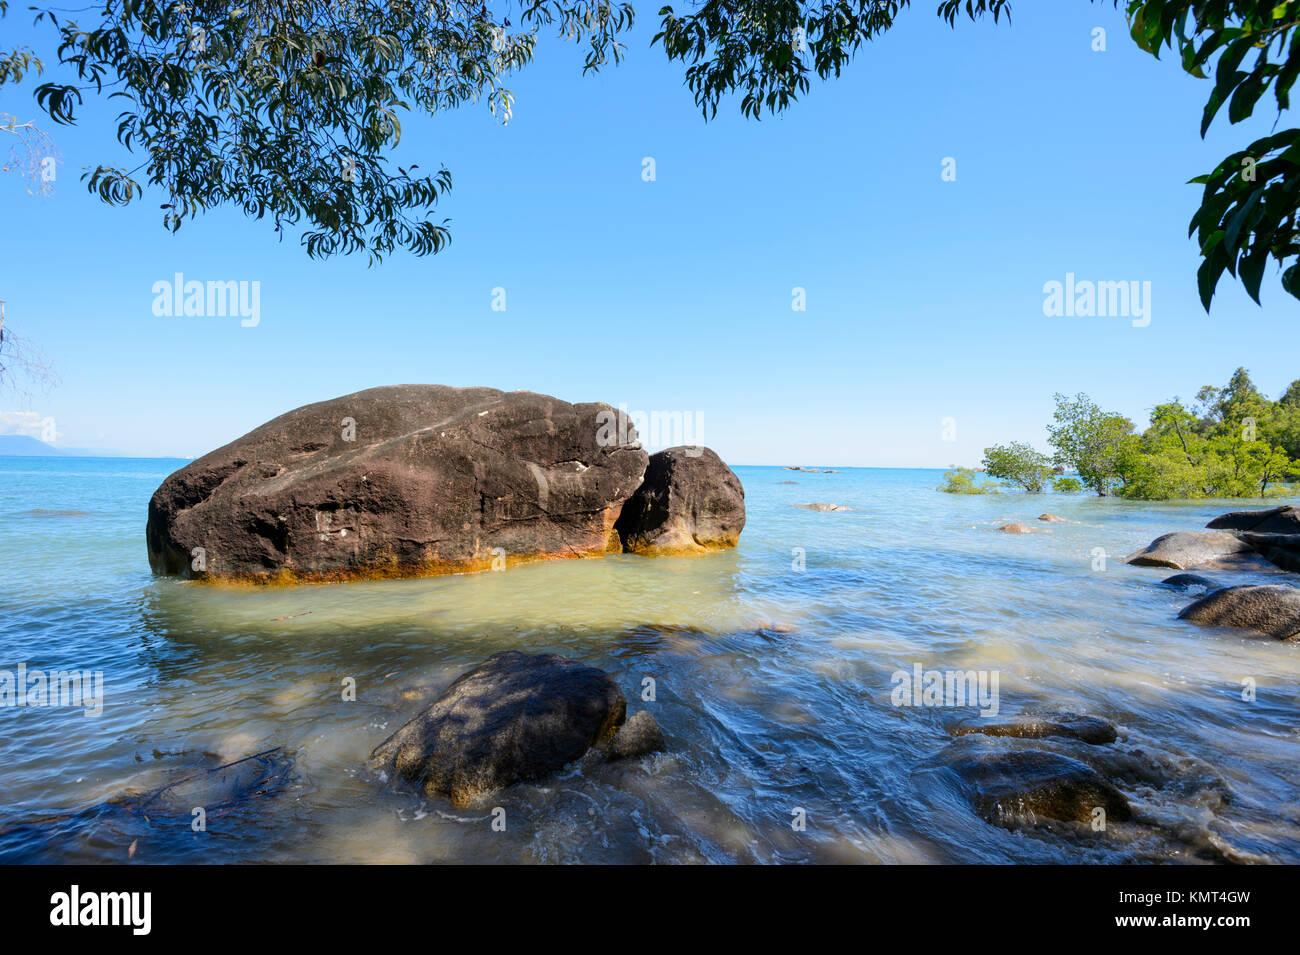 Scenic coastline at Yarrabah, Aboriginal Shire, near Cairns, Far North Queensland, FNQ, QLD, Australia - Stock Image